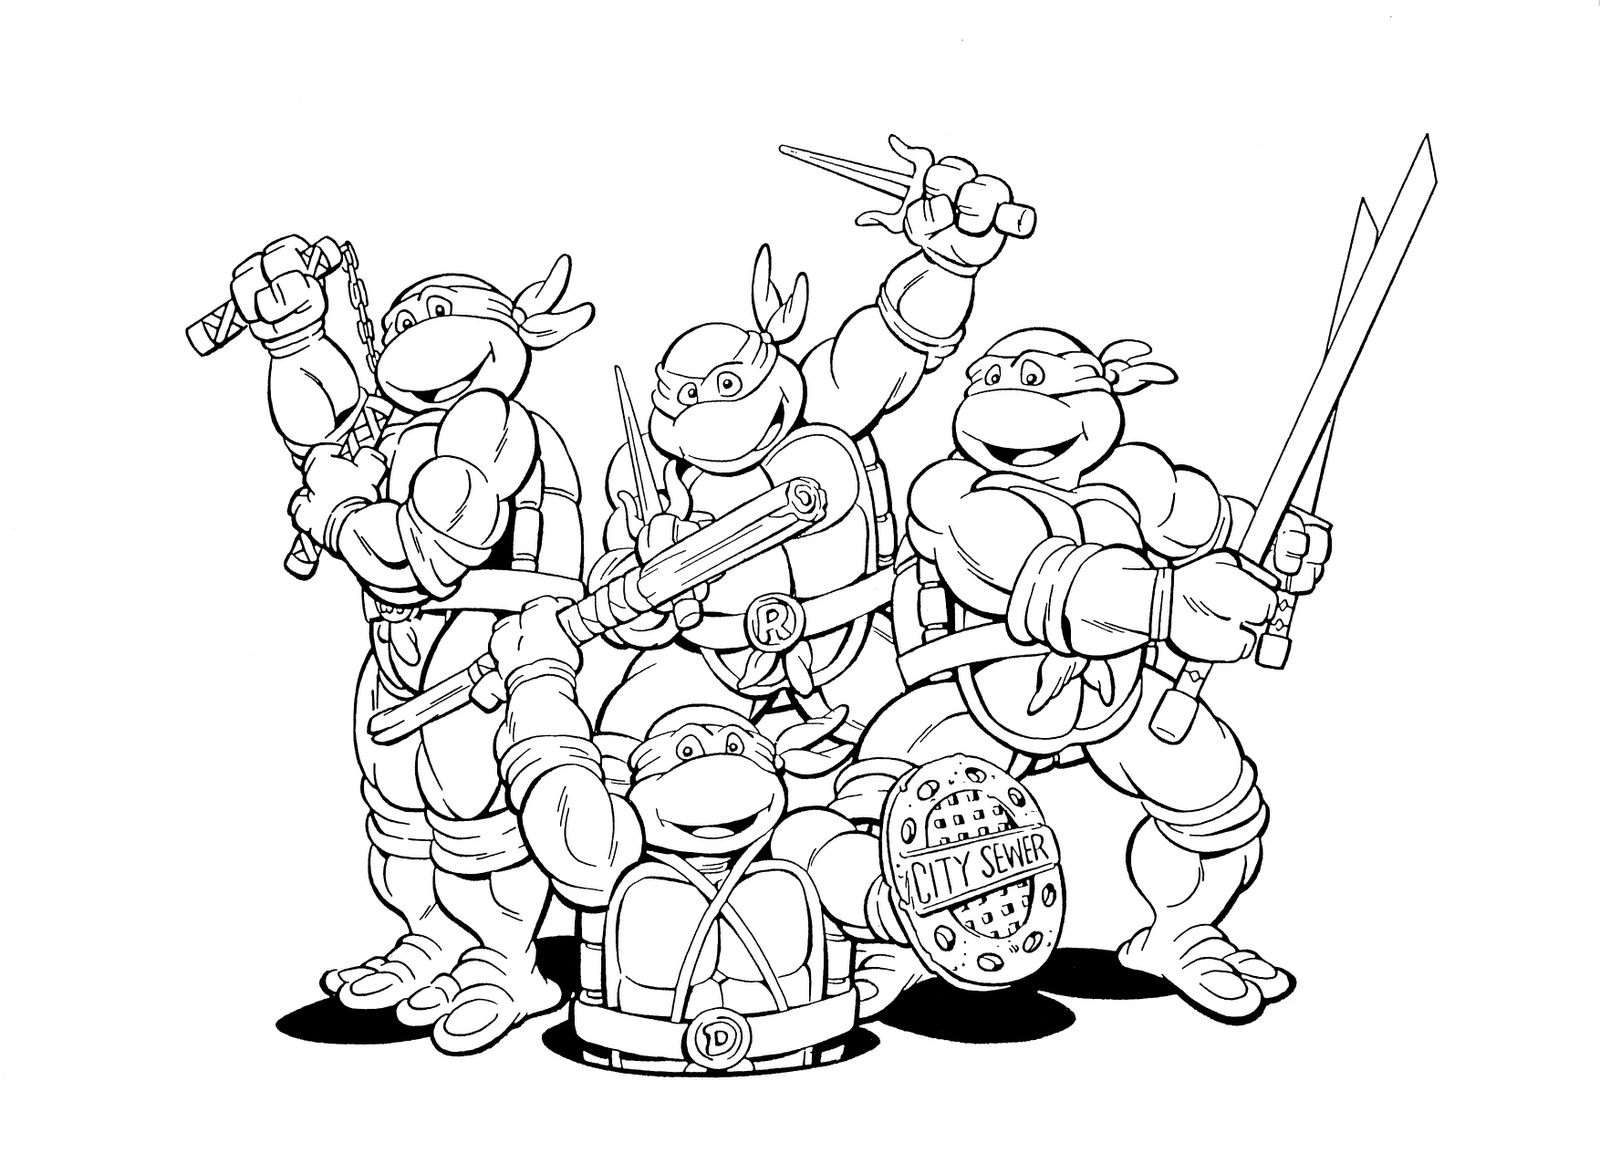 free ninja turtles coloring pages get this tmnt ninja turtles coloring pages printable 41271 ninja turtles coloring pages free